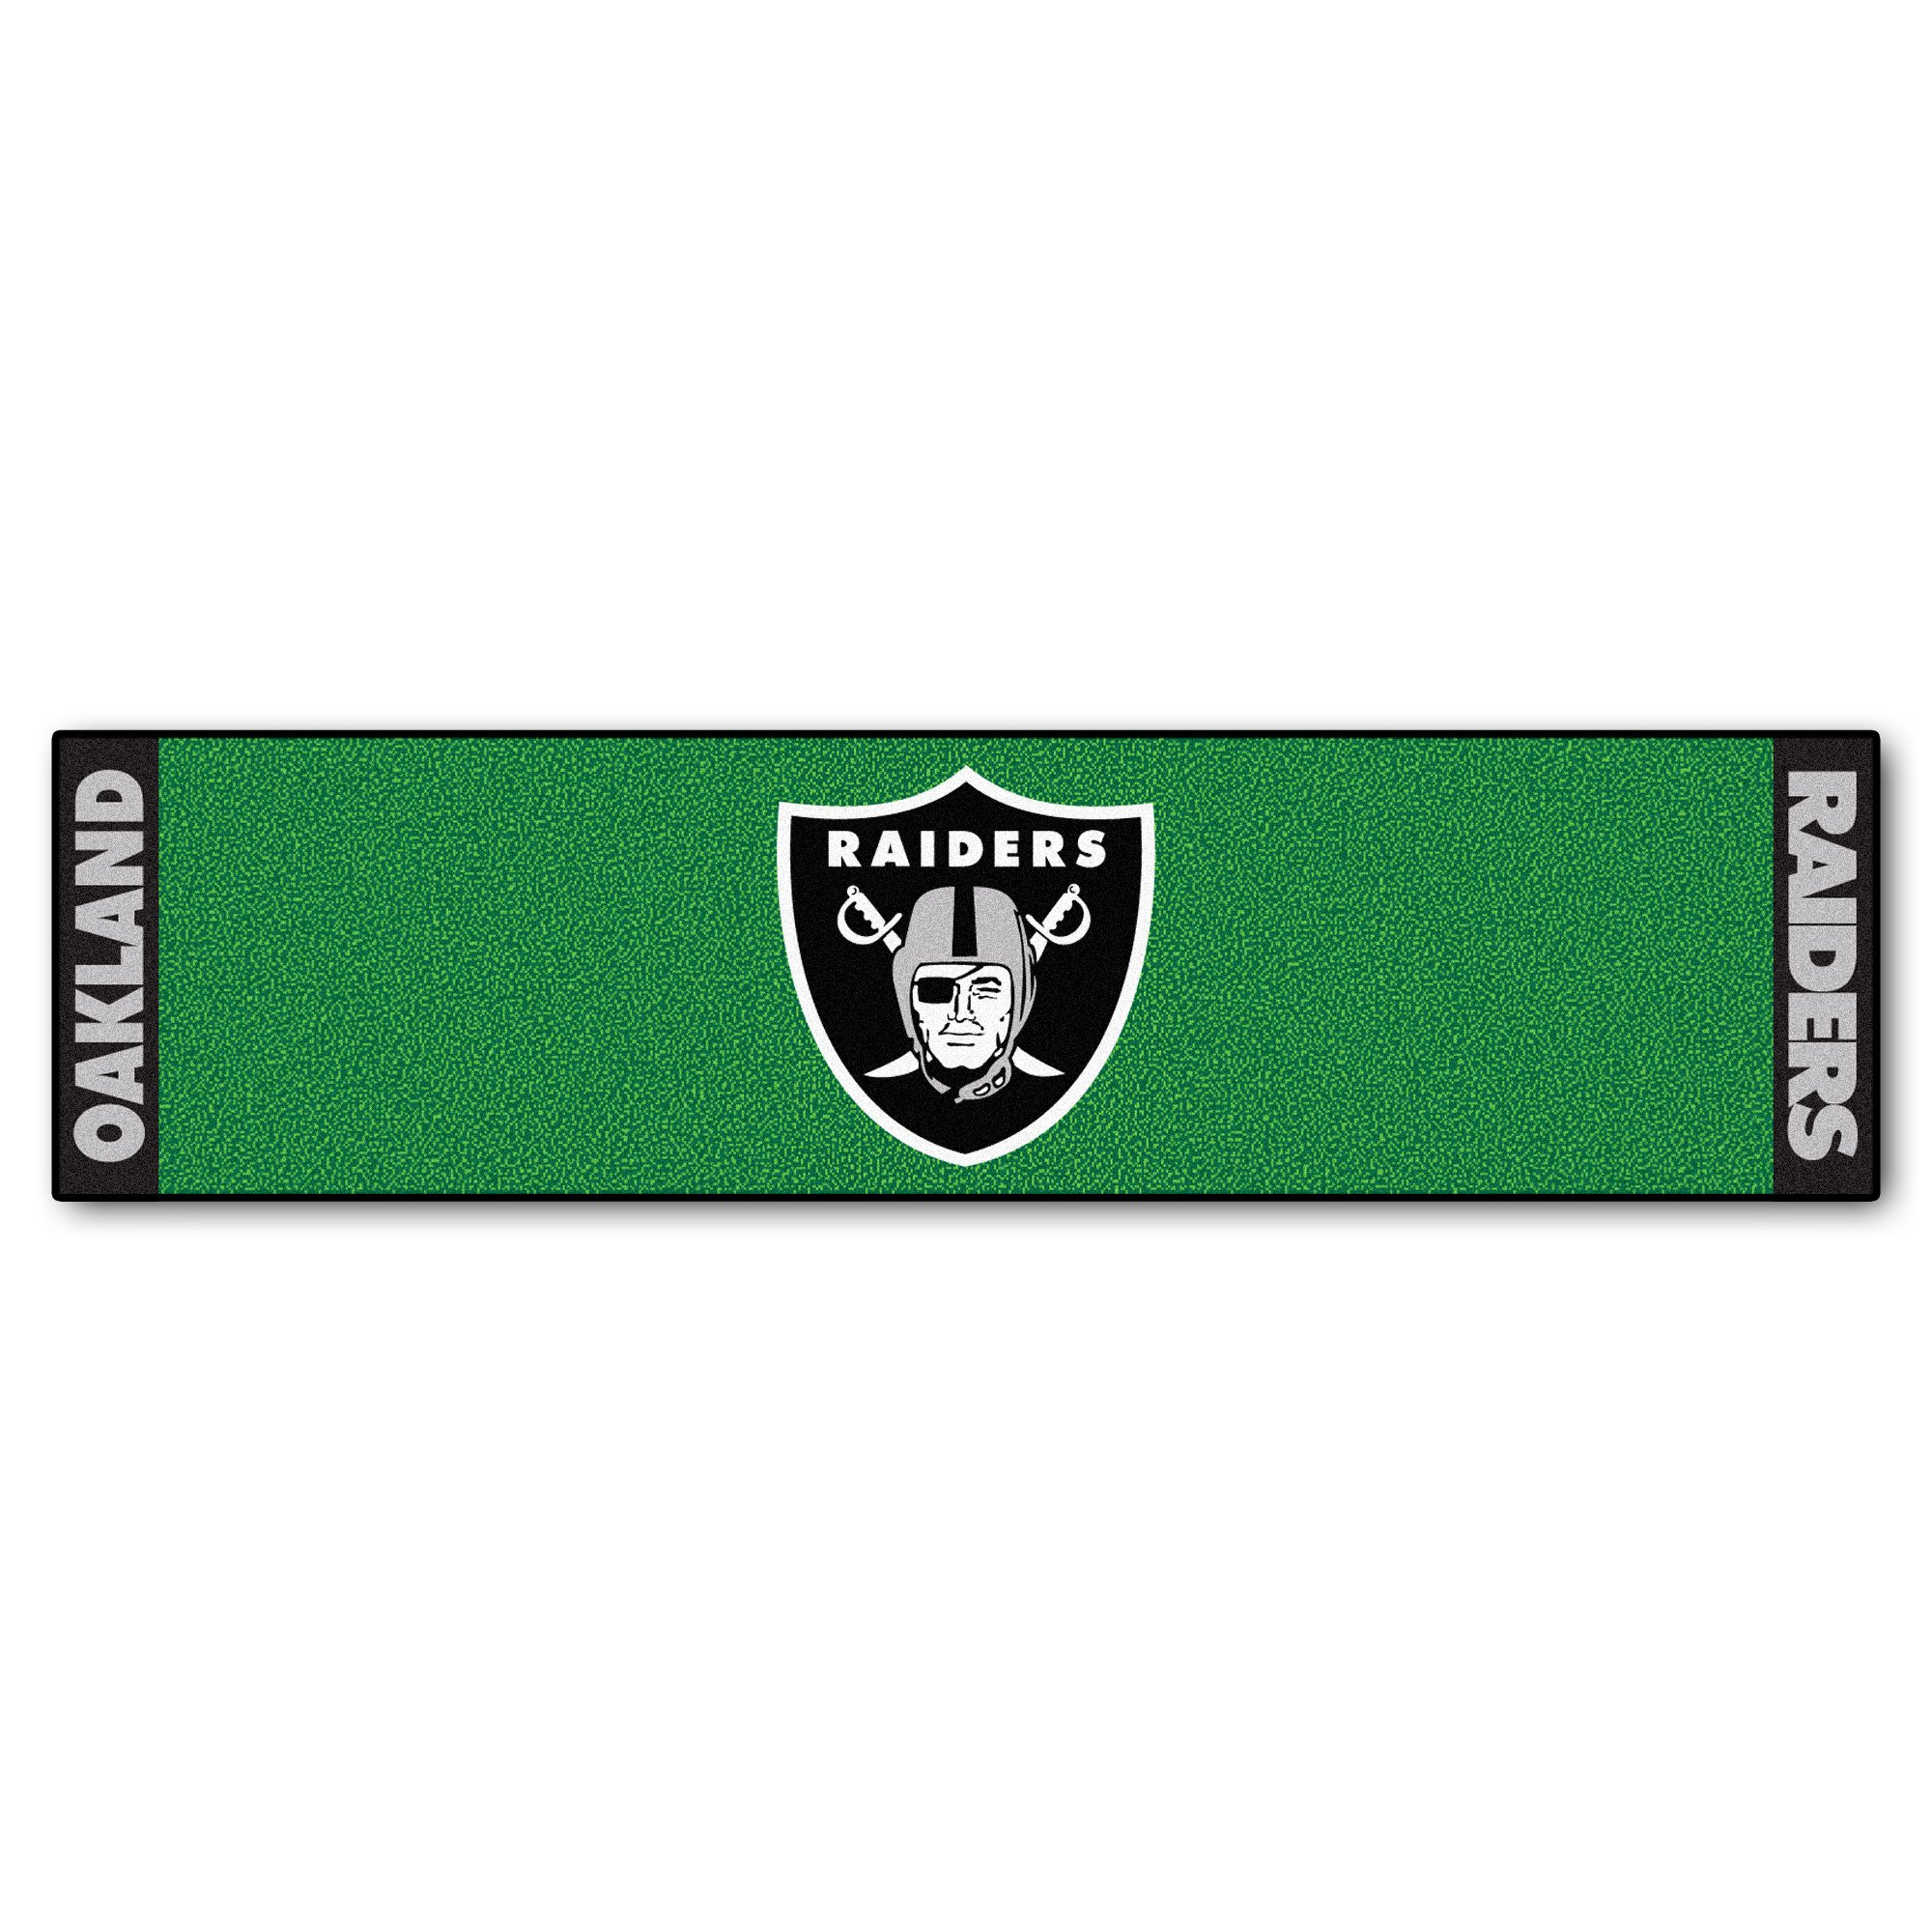 Fanmats NFL Oakland Raiders Nylon Face Putting Green Mat by Fanmats (Image #1)